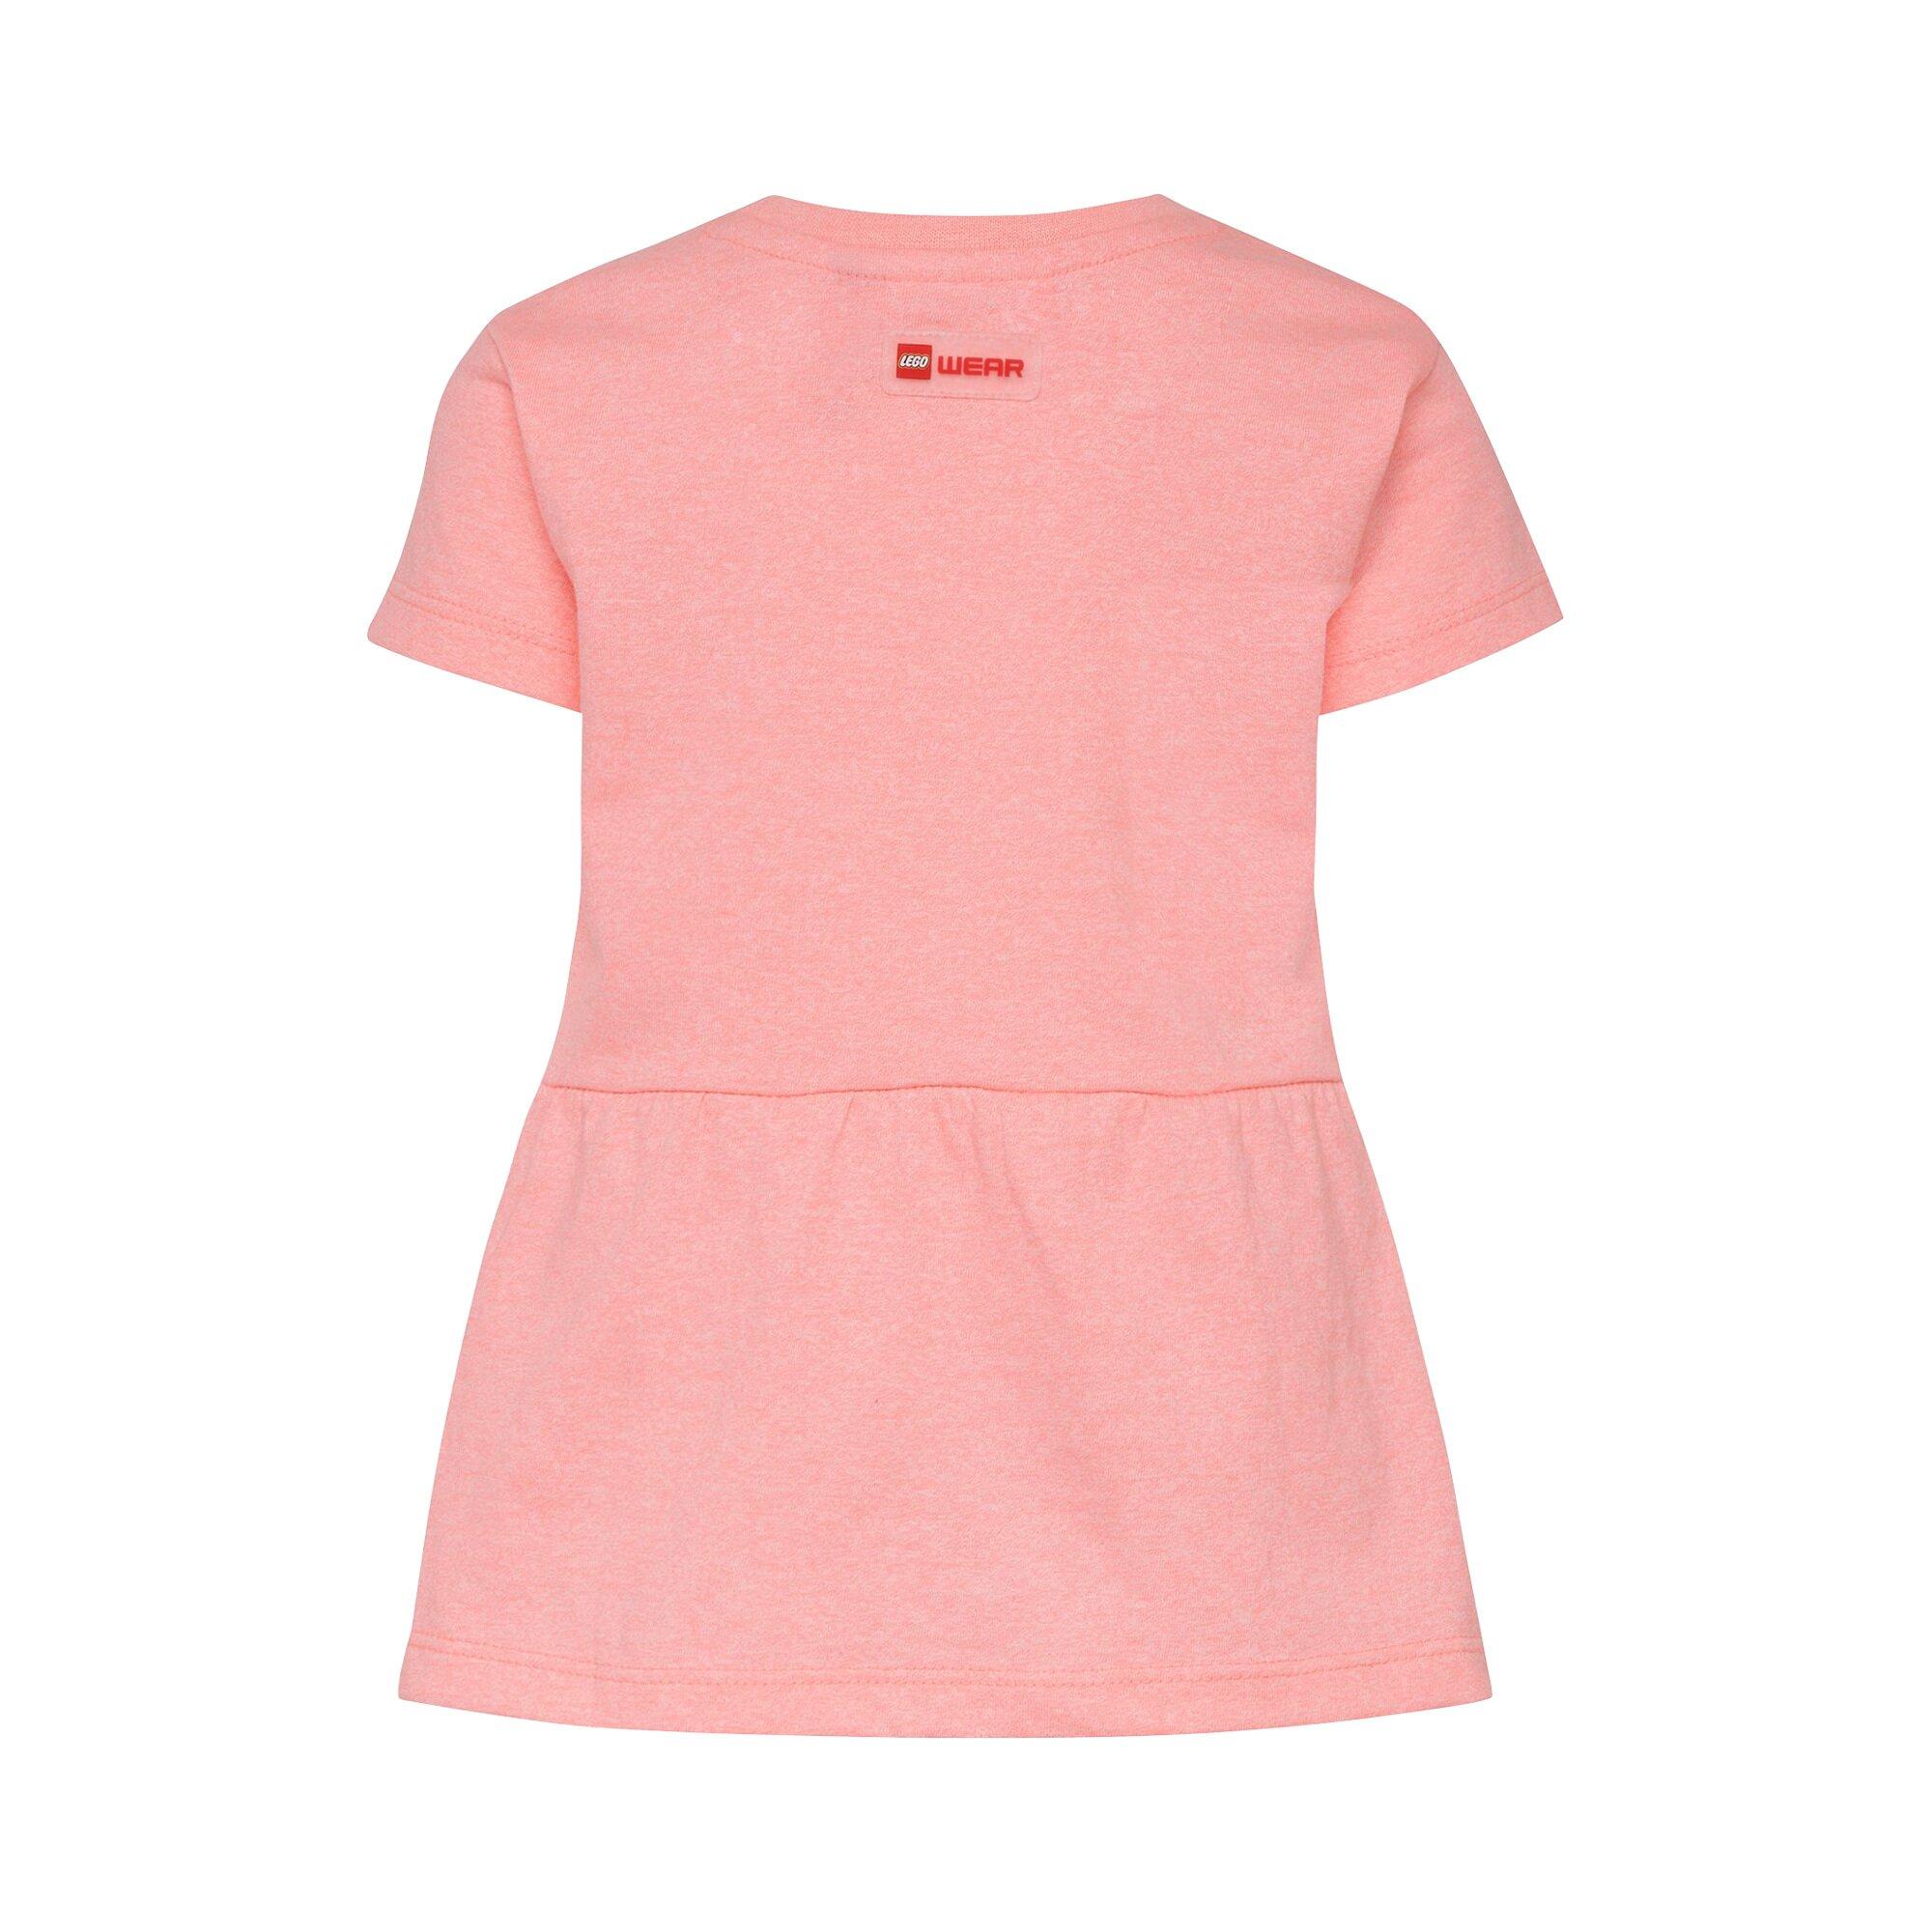 lego-wear-t-shirt-thelma-herz